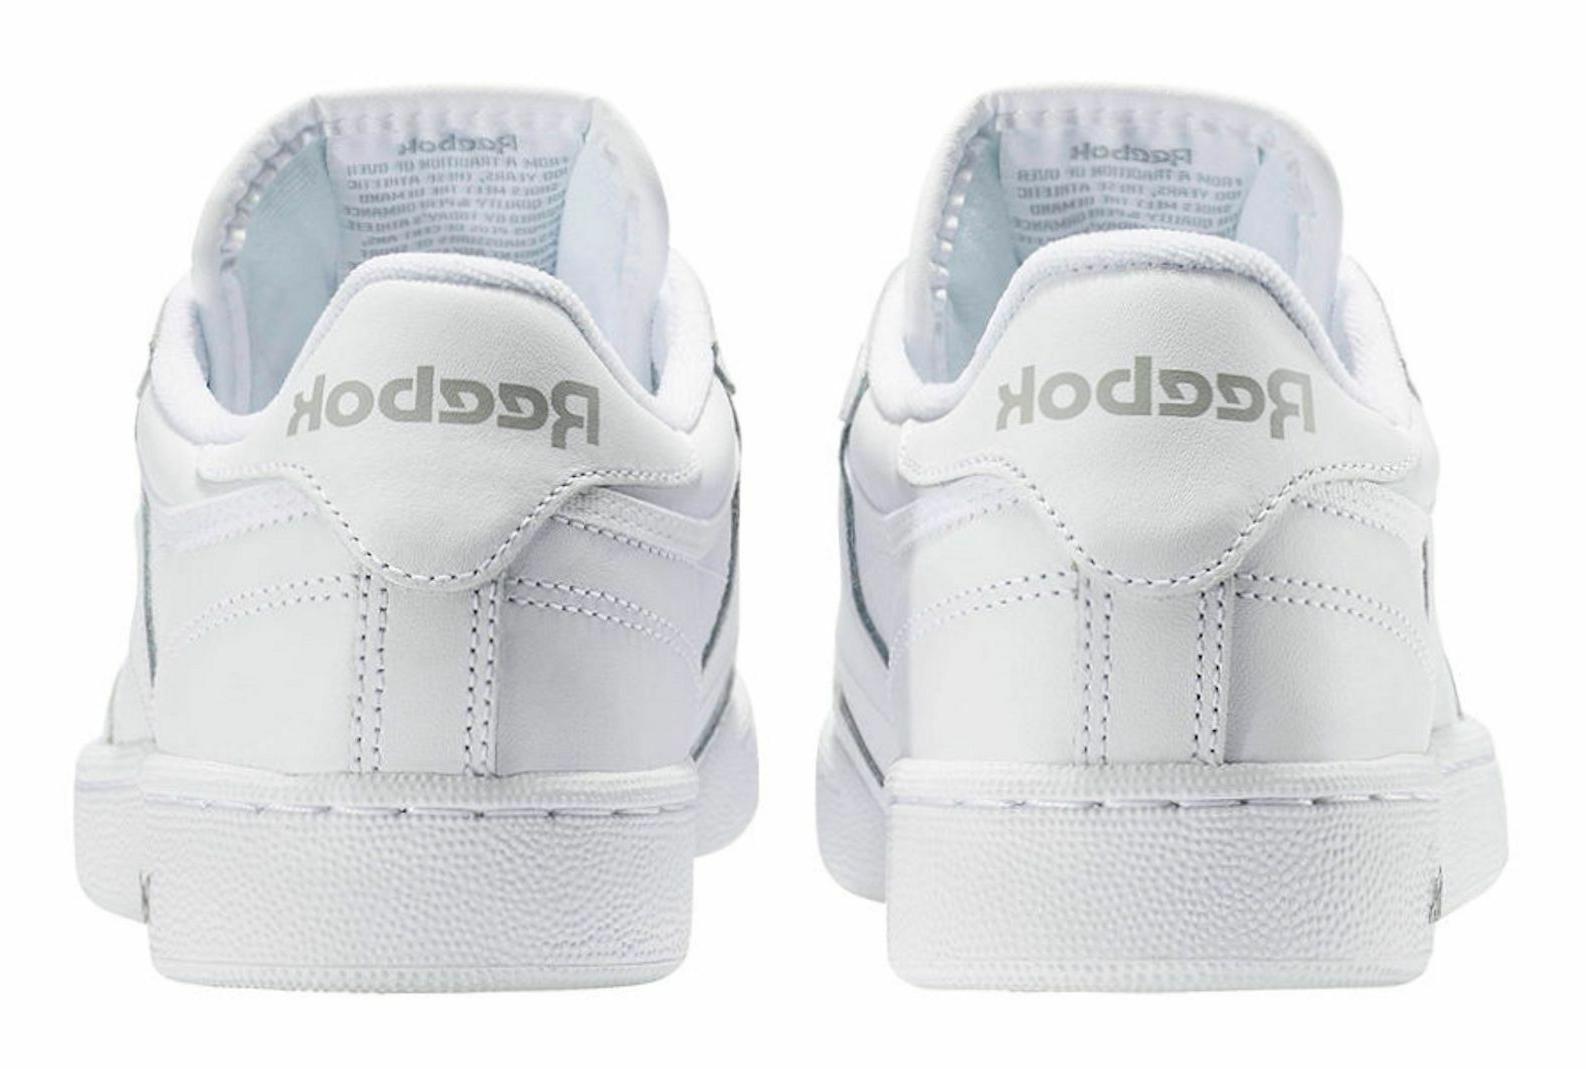 Reebok Classic 85 Sheer Mens Shoes Item AR0455